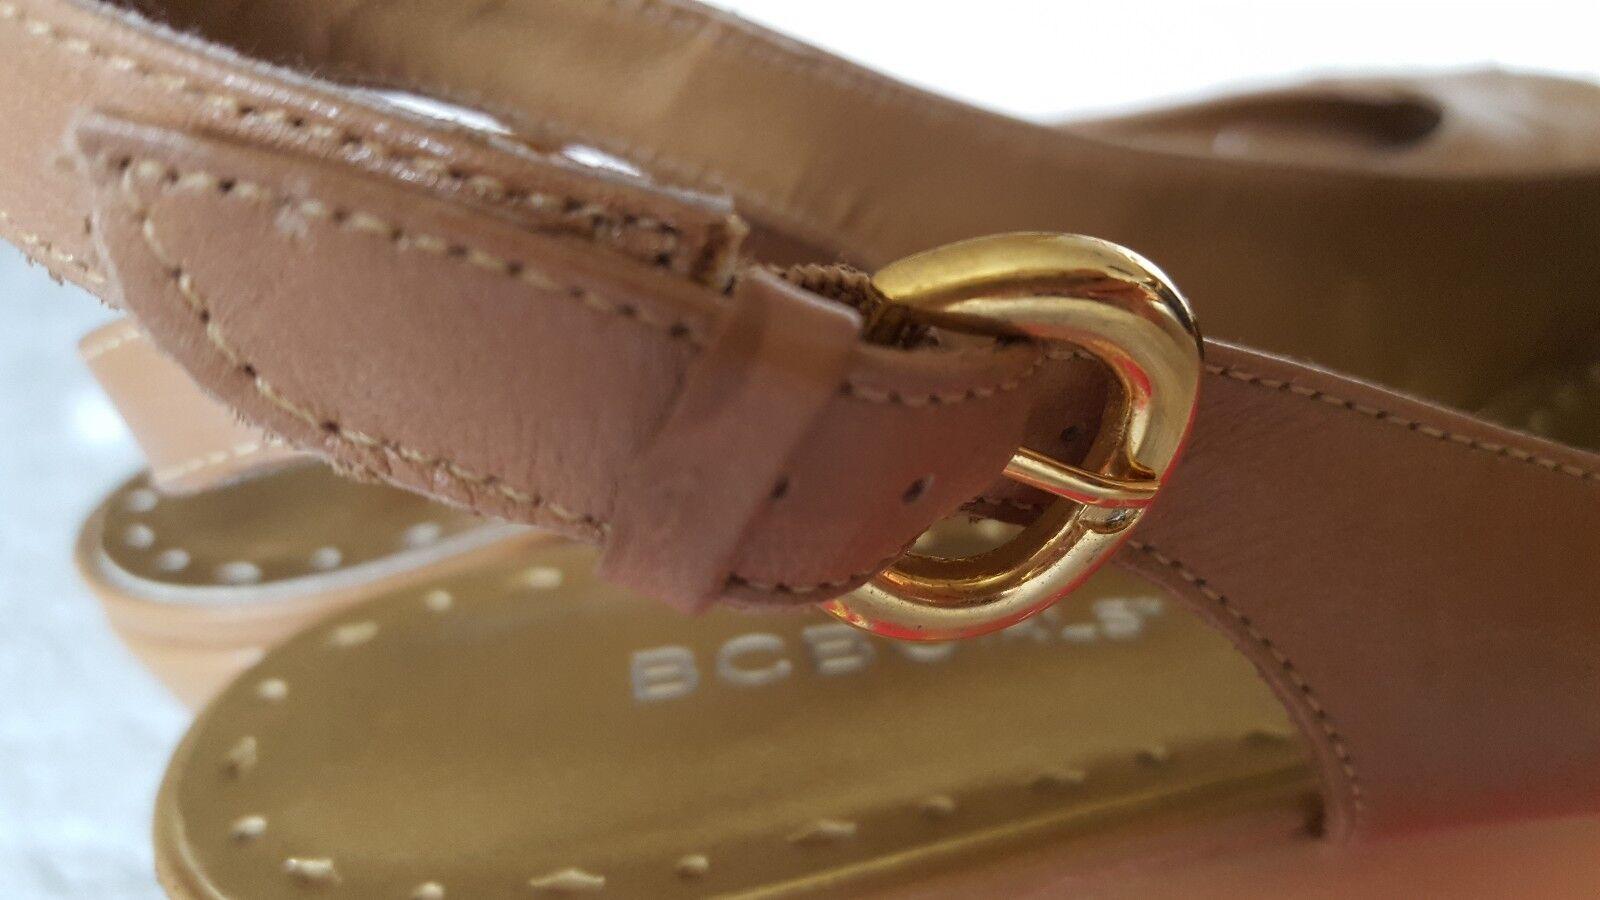 BCBGirls Gion New Calf Sugar Braun Wedge Slingback Wedge Braun Sandales Größe 9 B 35de9b